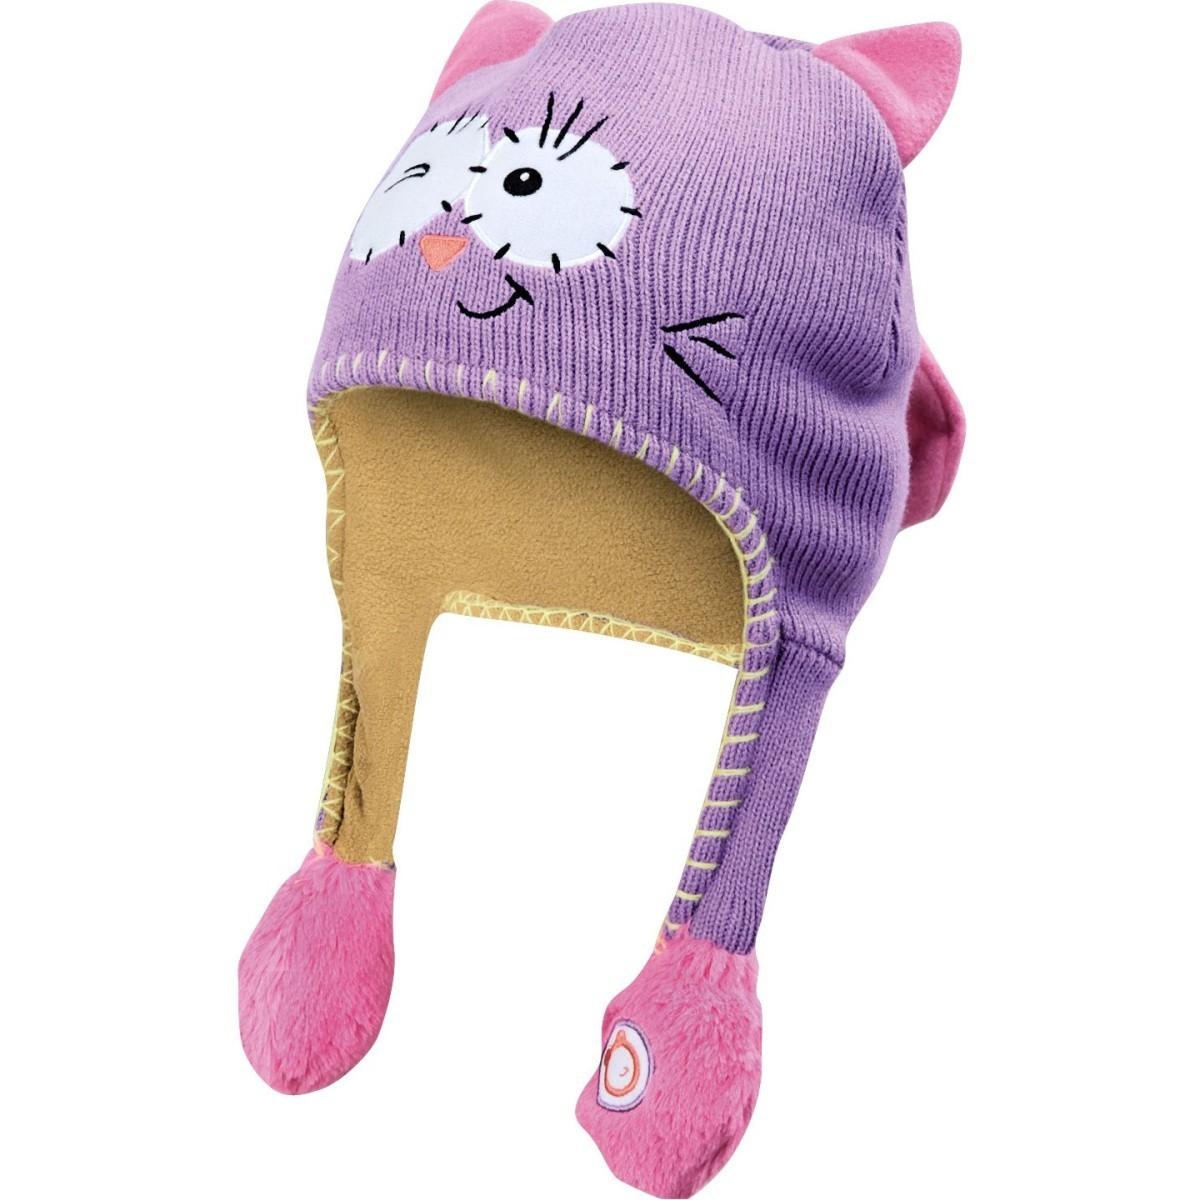 Flipeez Hats: Sombrero Divertido Gorro Hat Flipeez Peek-a-Boo Monster